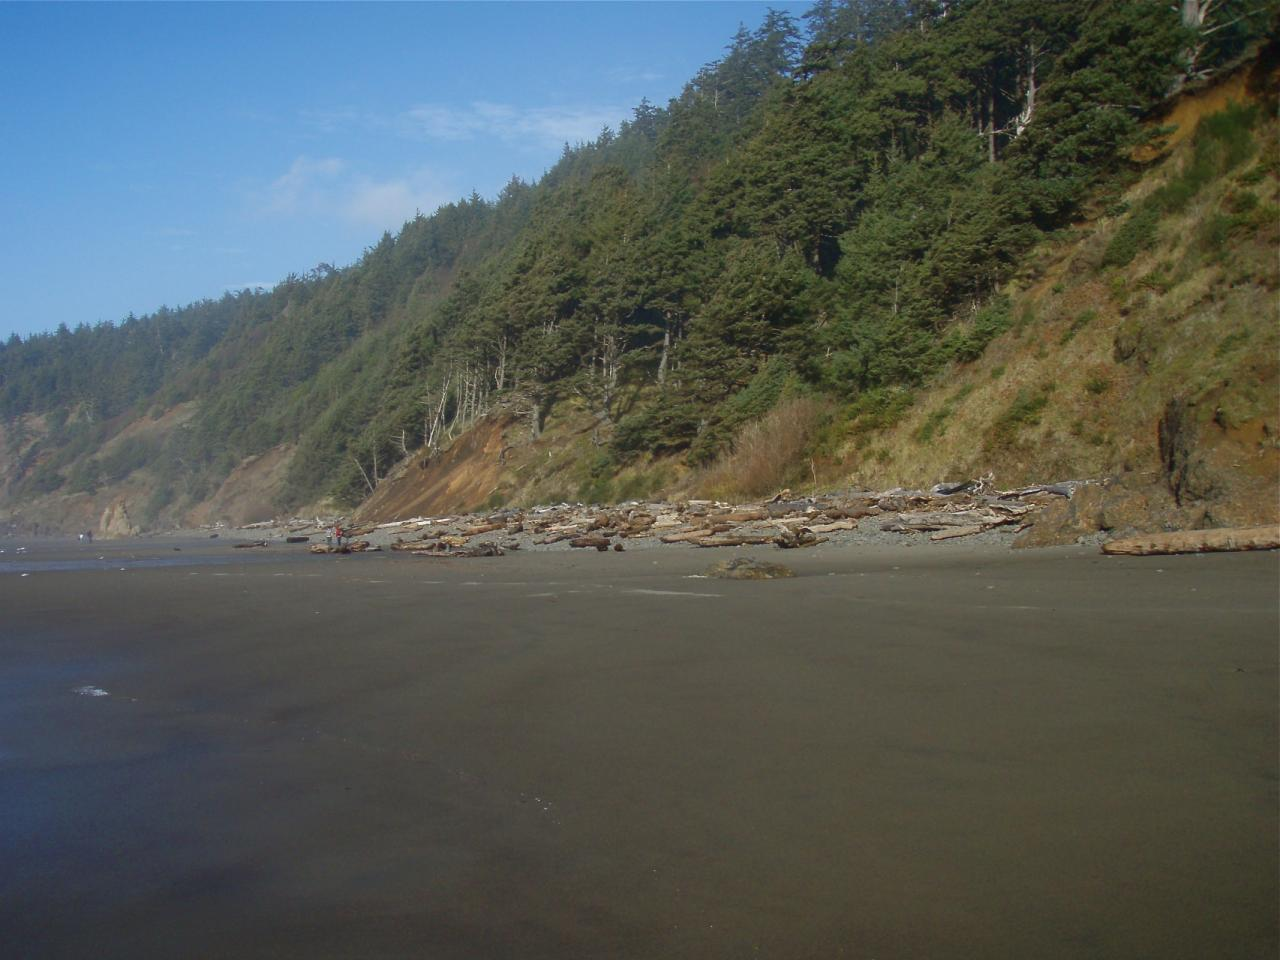 Shows clean beach, a few walkers and logs thrown up high on beach.